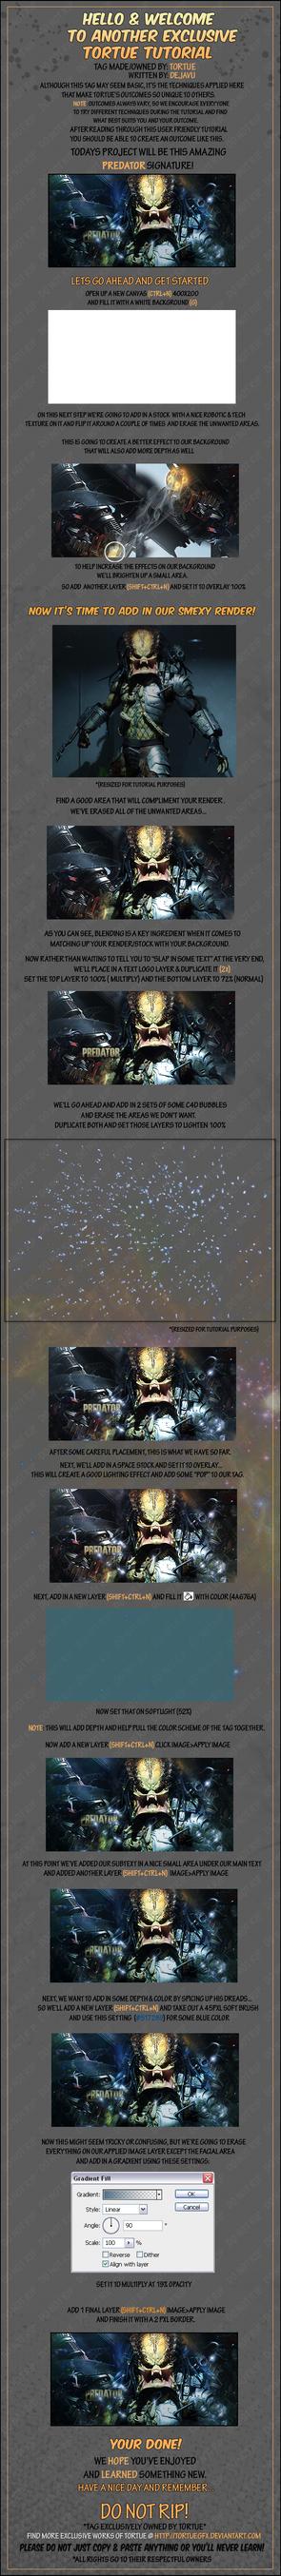 Predator tutorial by Tortuegfx